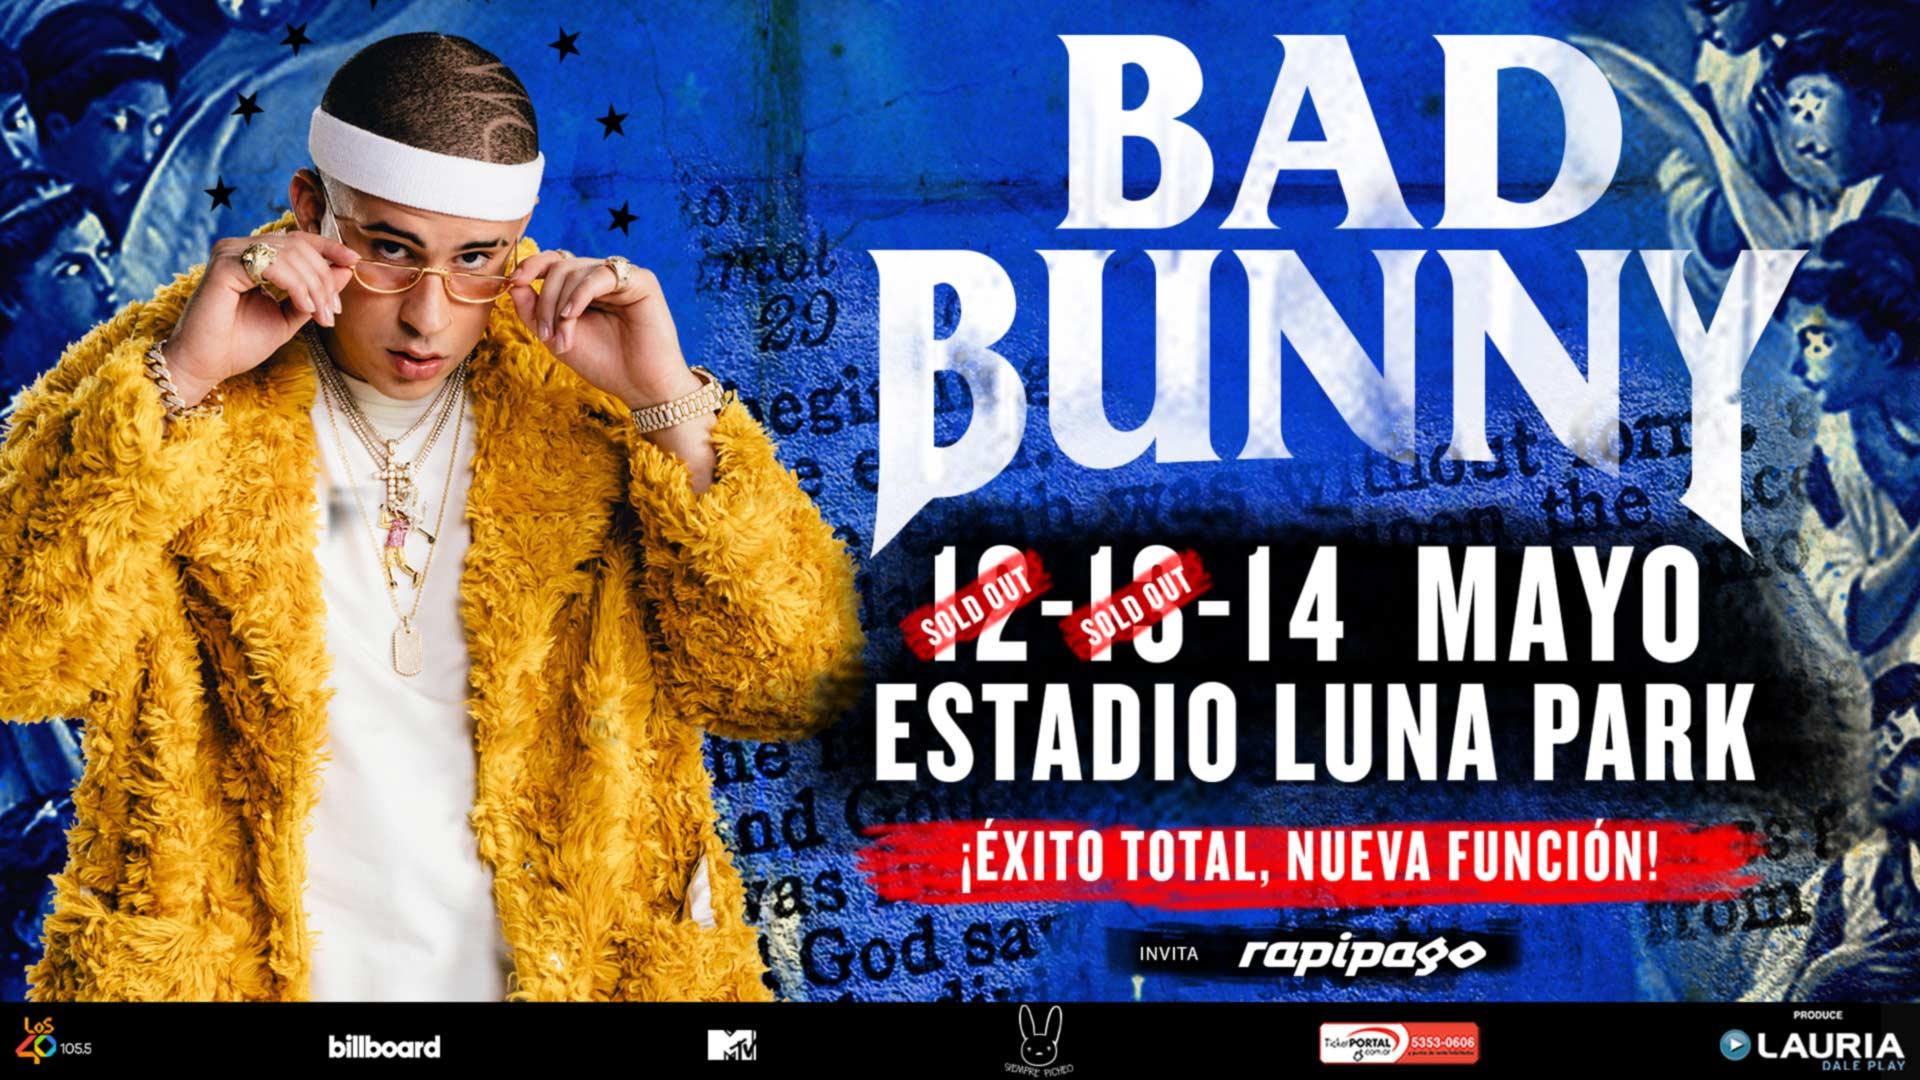 BAD BUNNY | Stadium Luna Park